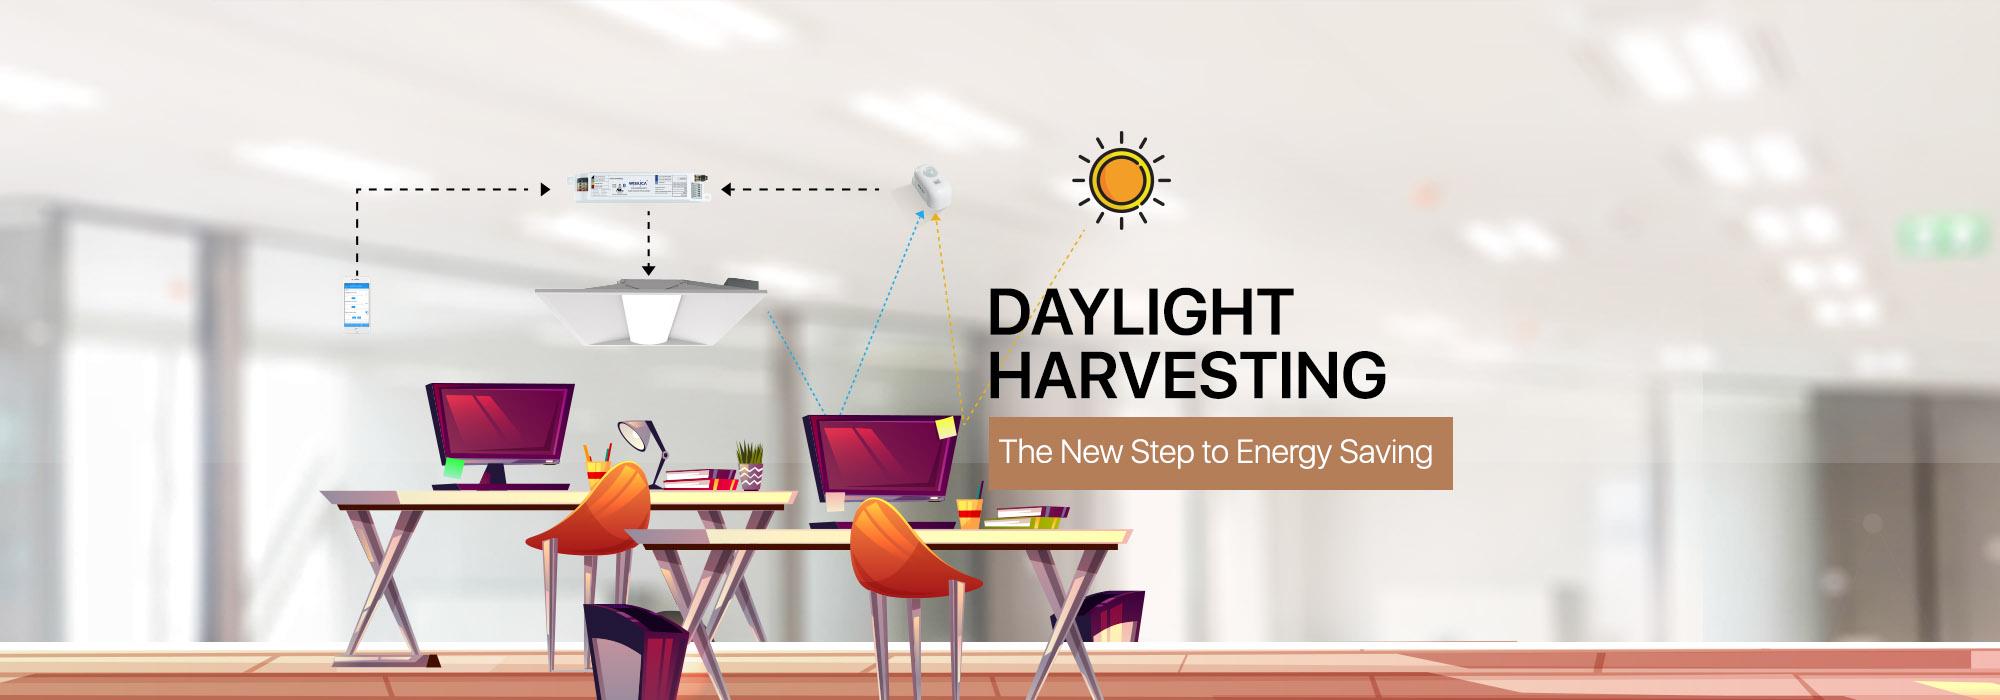 Lighting control strategy-Daylight harvesting